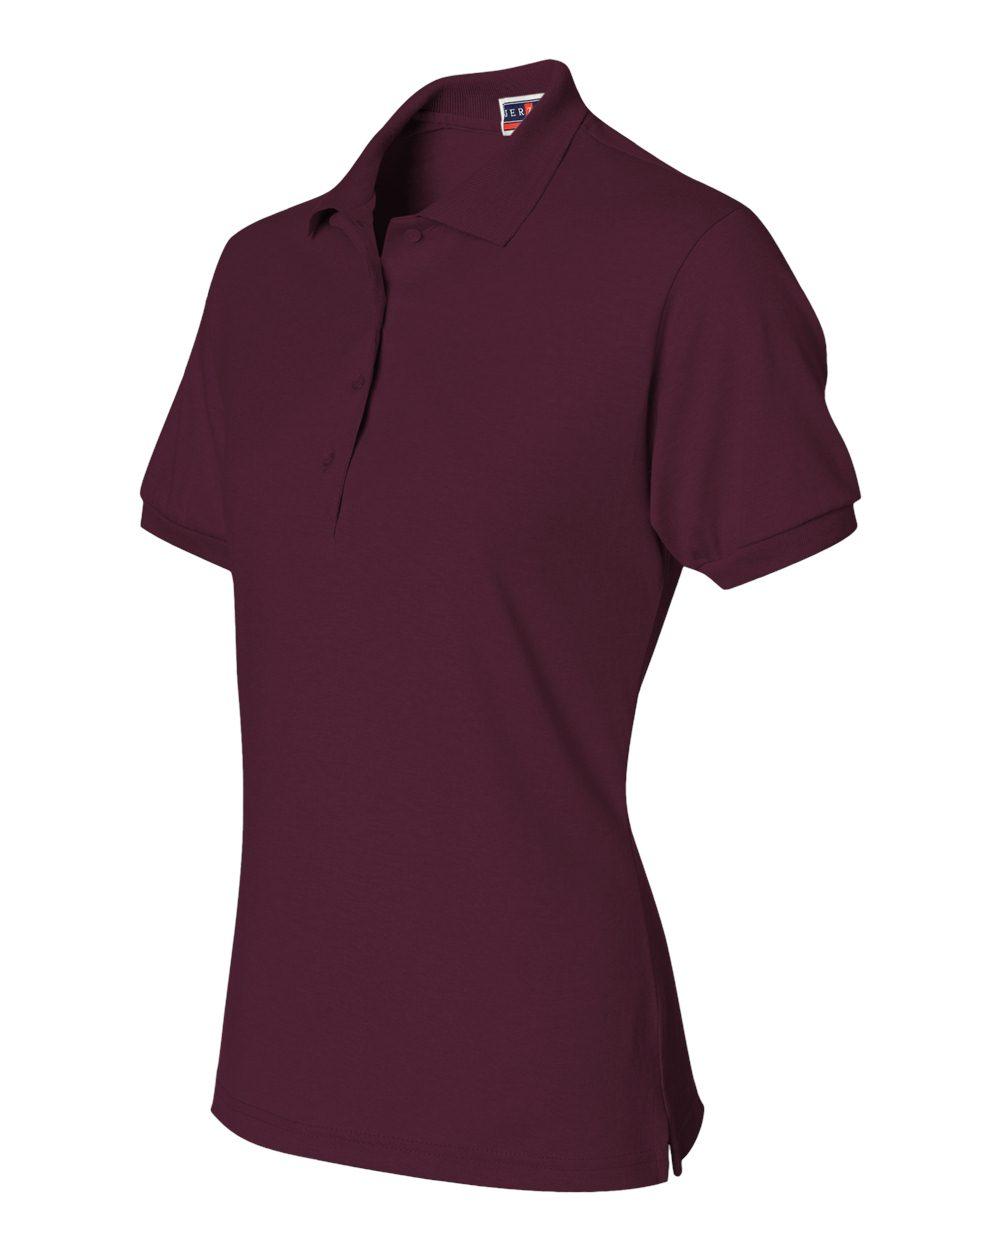 Jerzees-Womens-5-6-oz-50-50-Jersey-Polo-with-Spot-Shield-437W-Size-S-2XL thumbnail 44